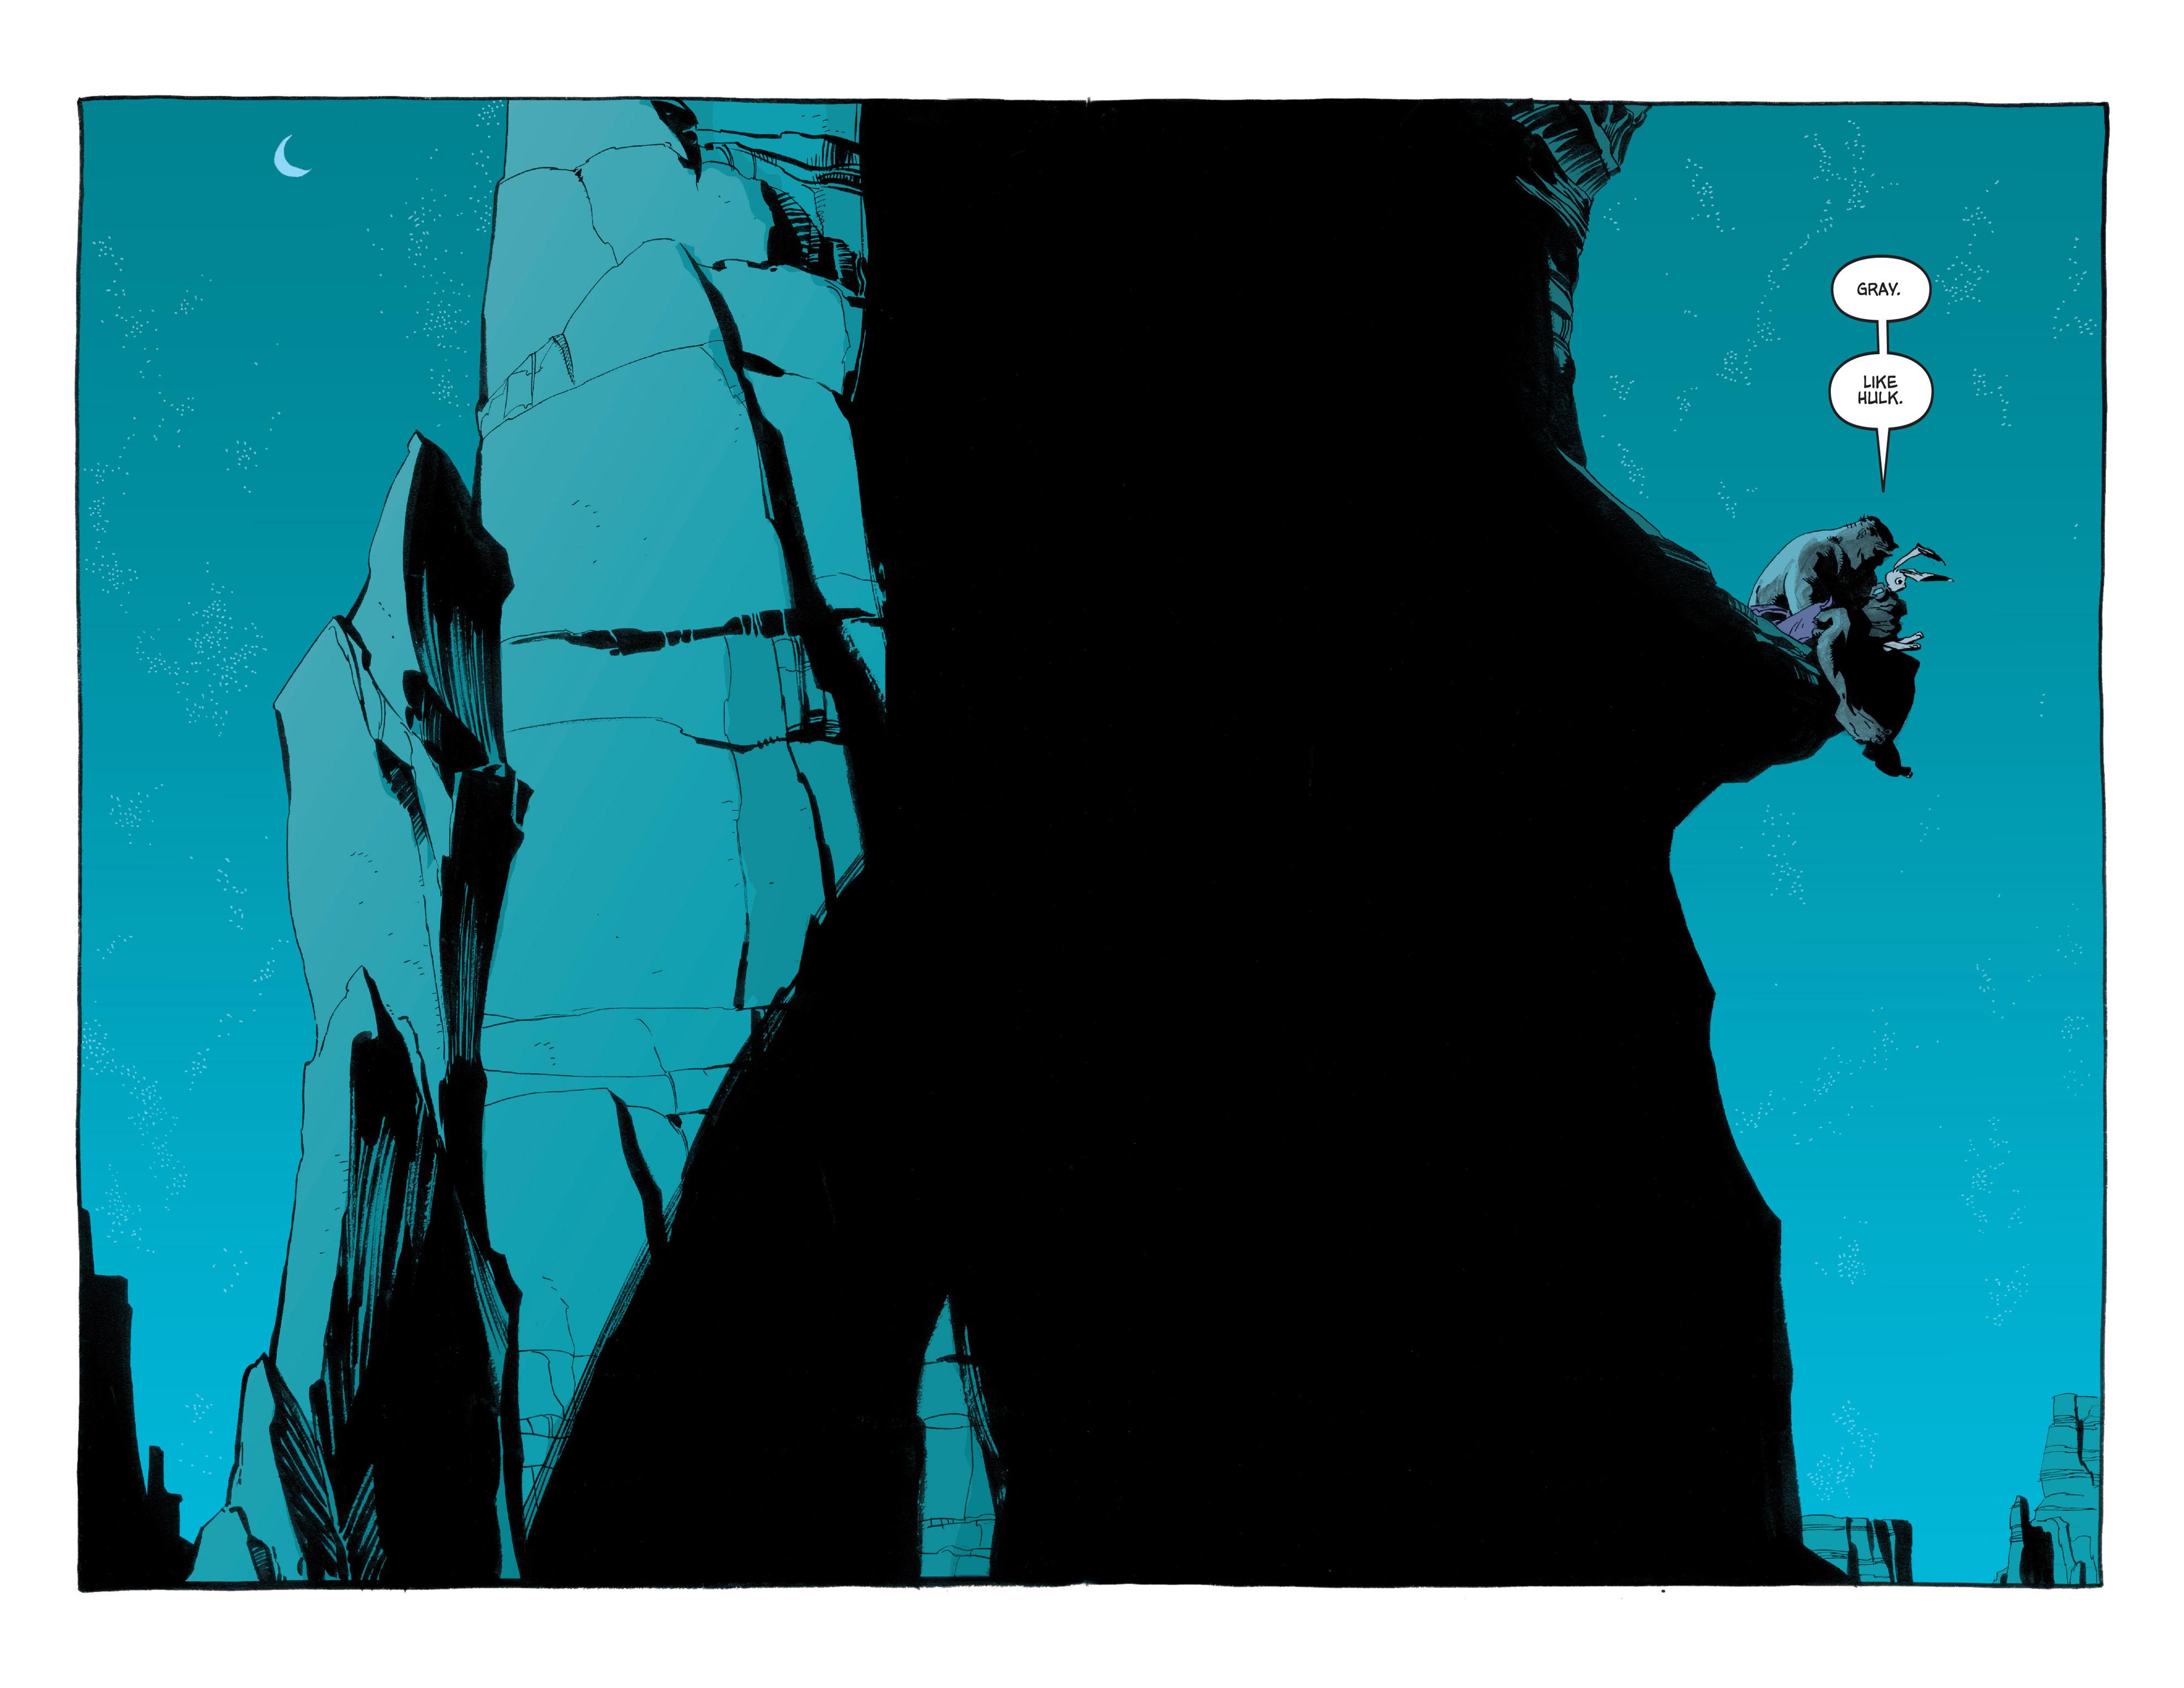 Read online Hulk: Gray comic -  Issue #3 - 4